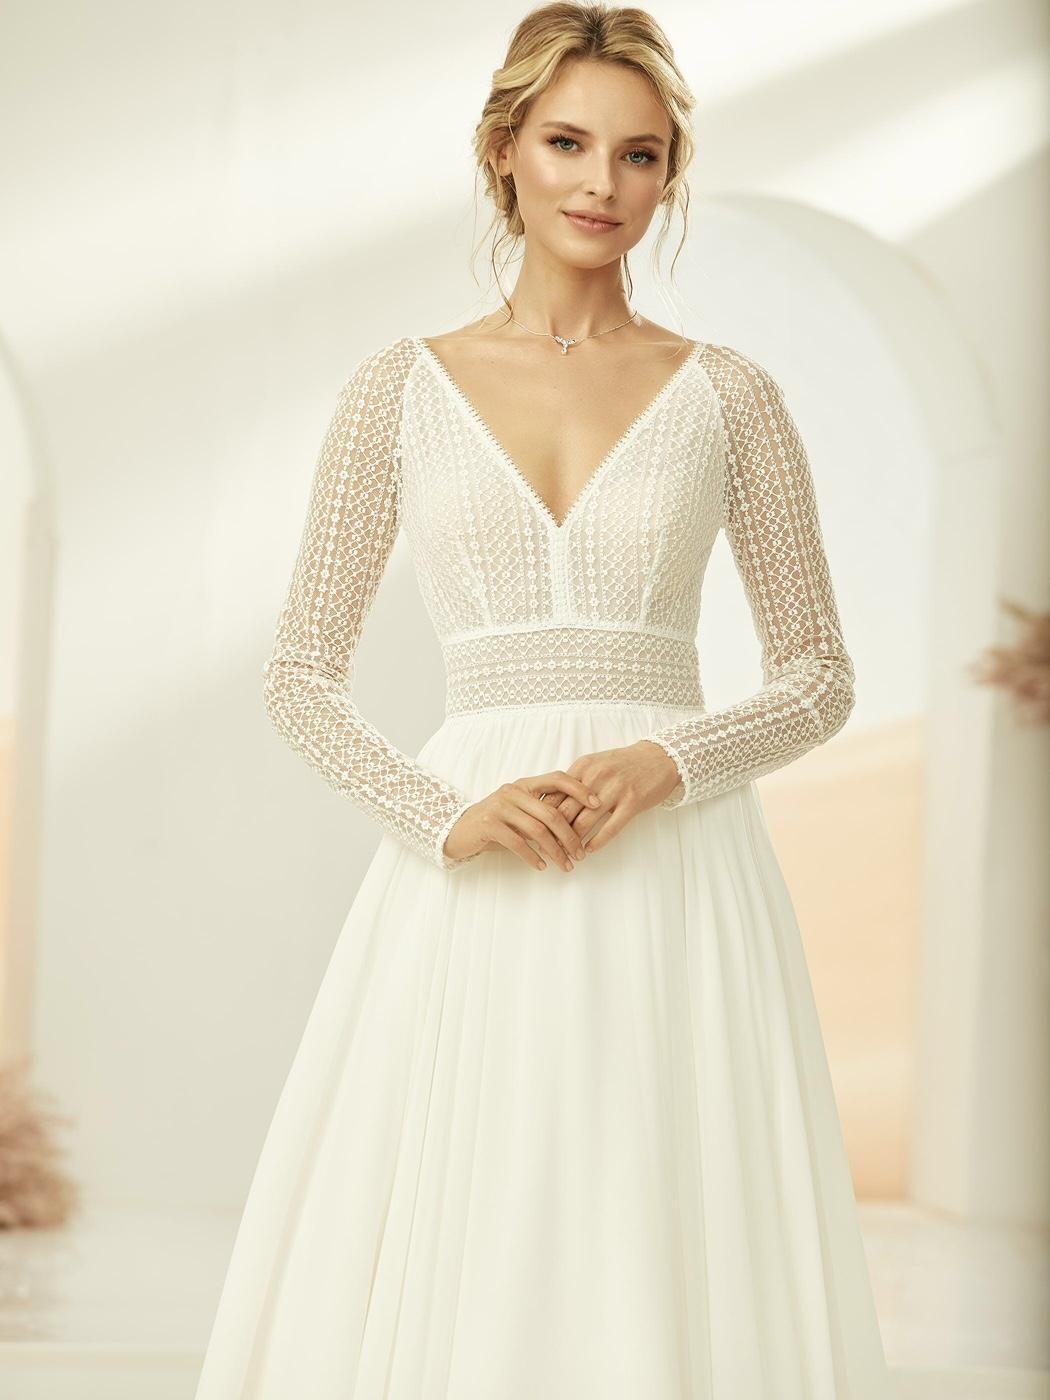 Jednoduché svadobné šaty - Obrázok č. 1